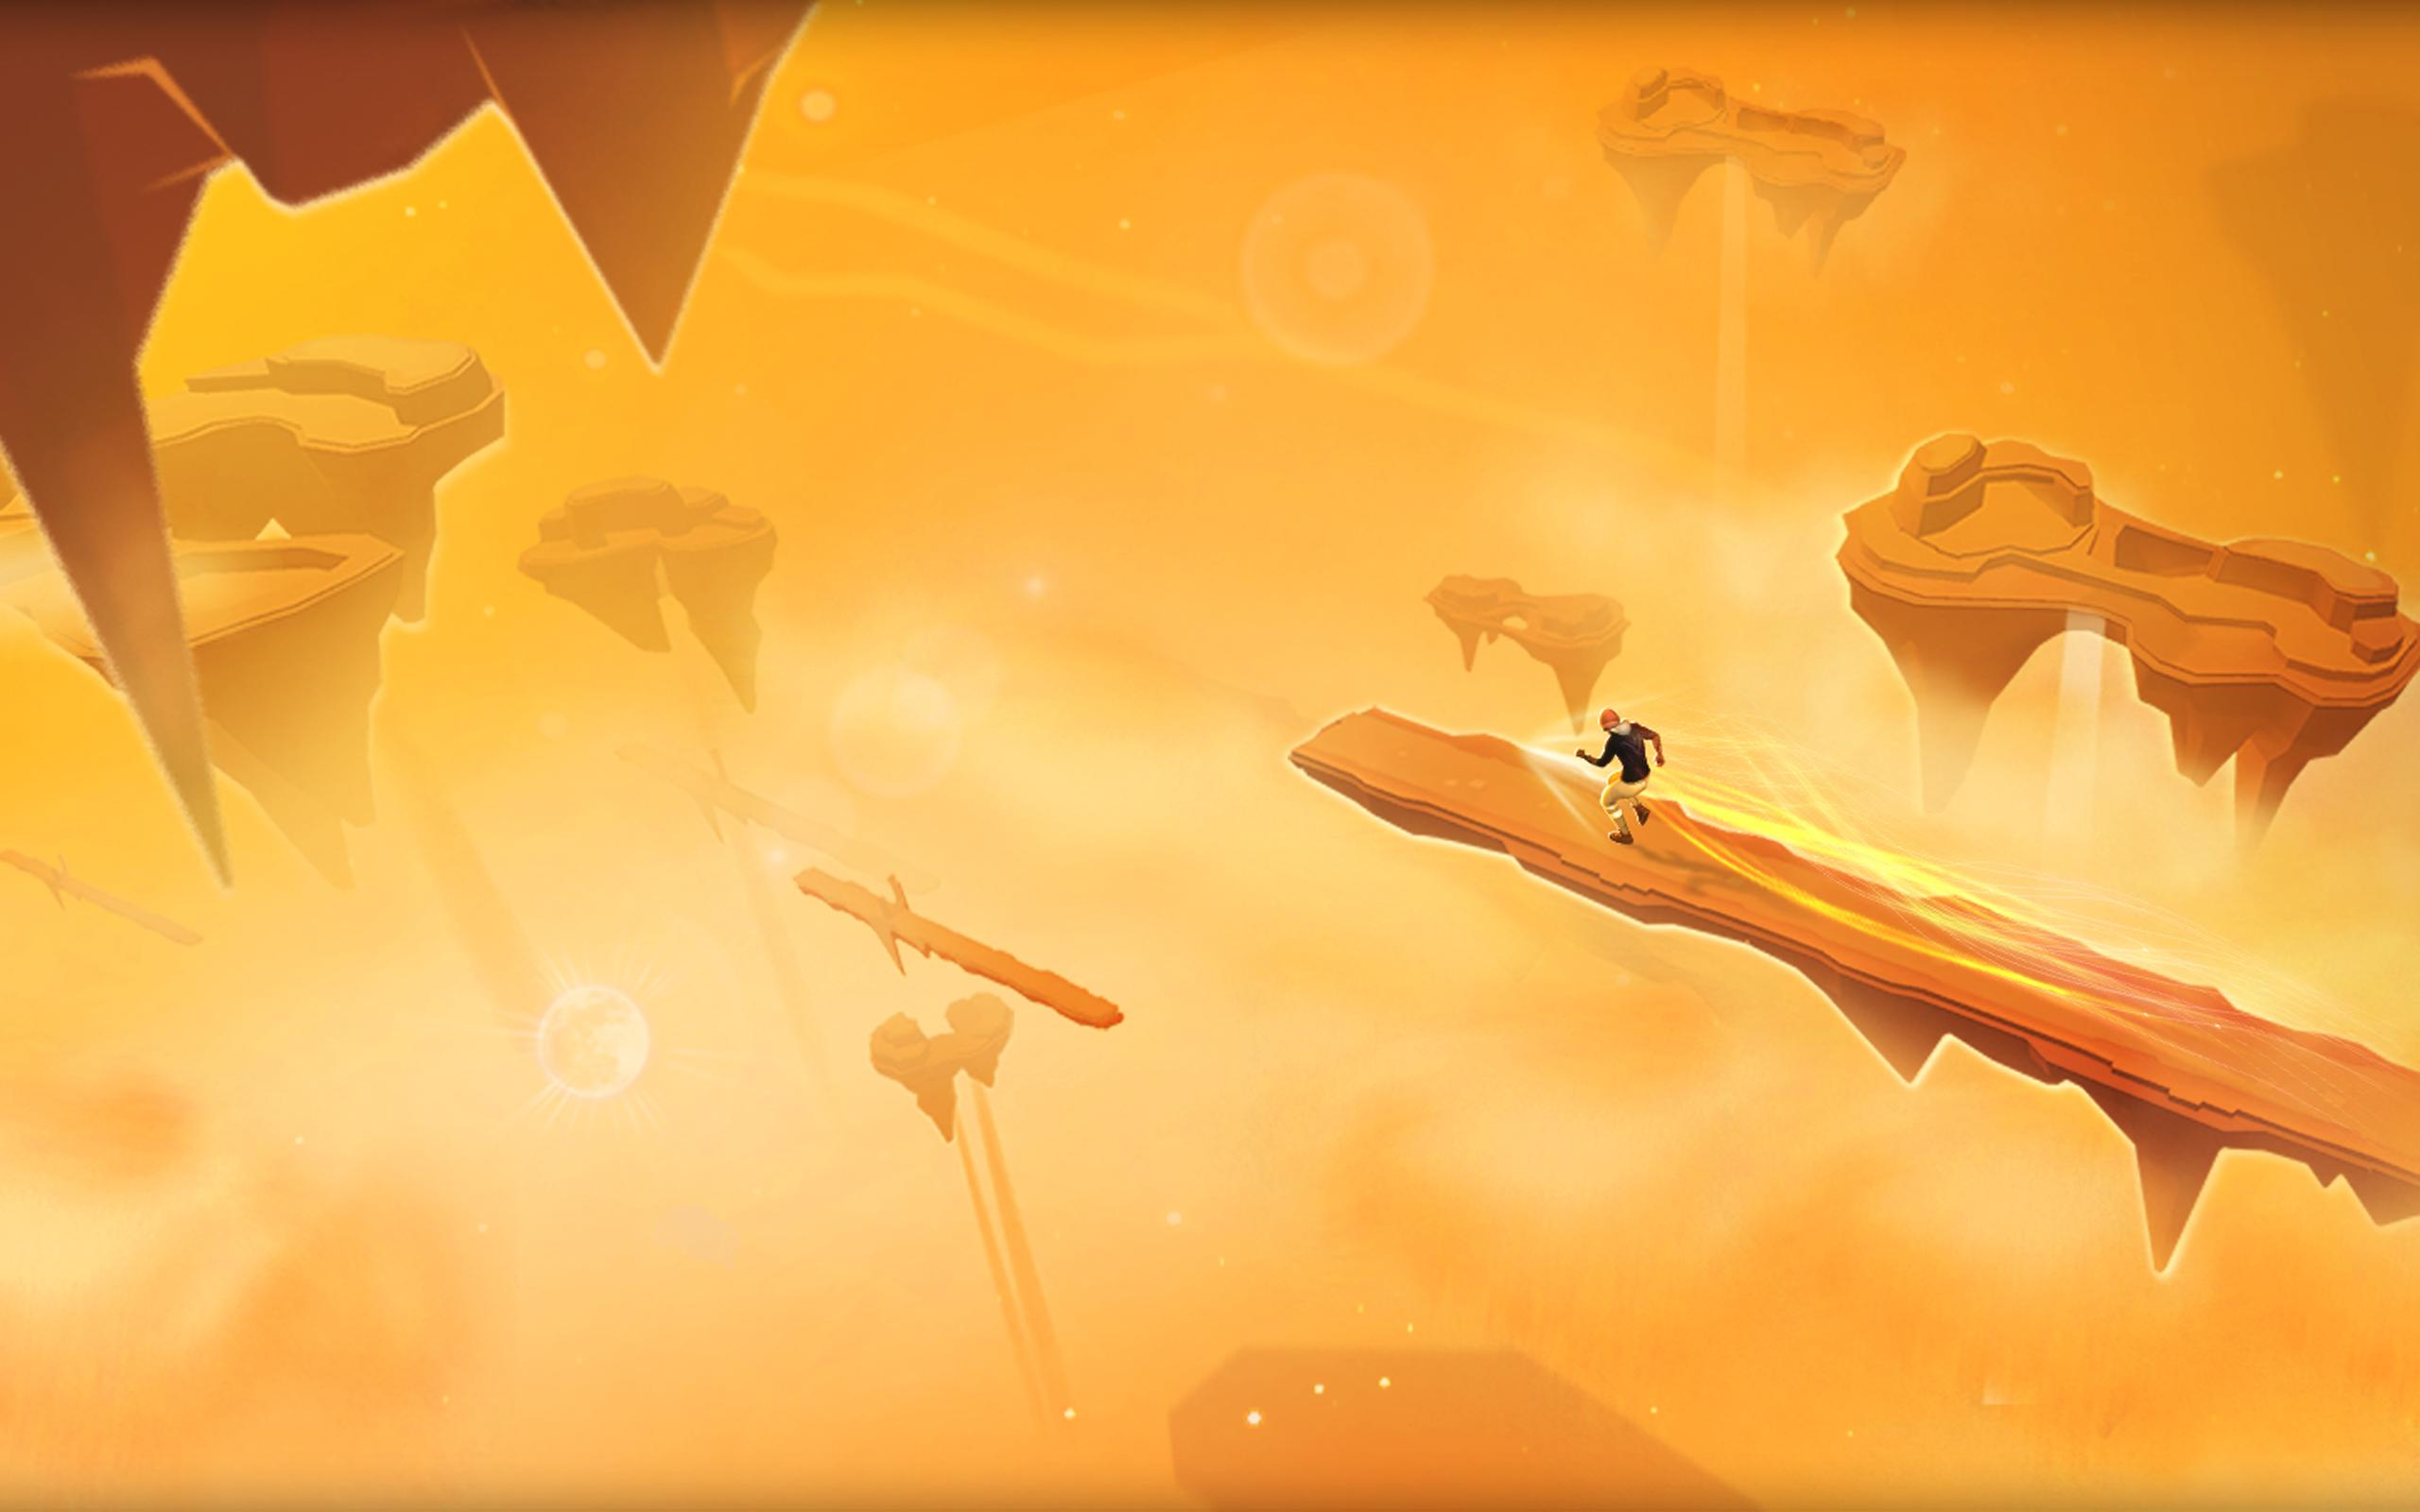 Sky Dancer Run - Running Game 4.2.0 Screenshot 12